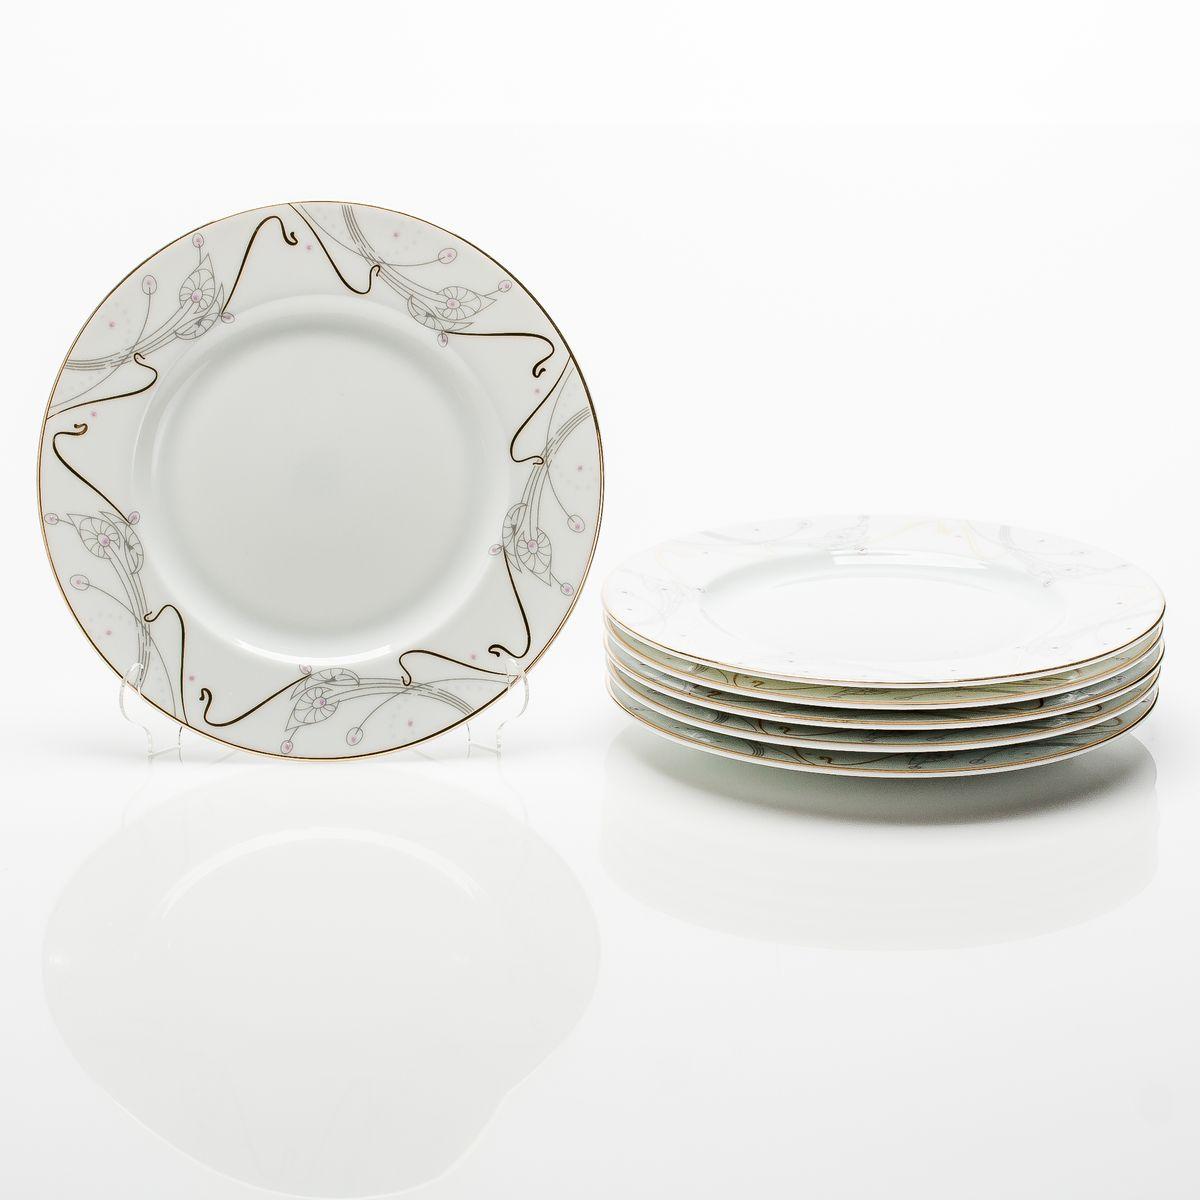 Тарелка десертная 19см 6 предметов АРТ-НУВО ZH09-KY24Margo 0924 TD19x6